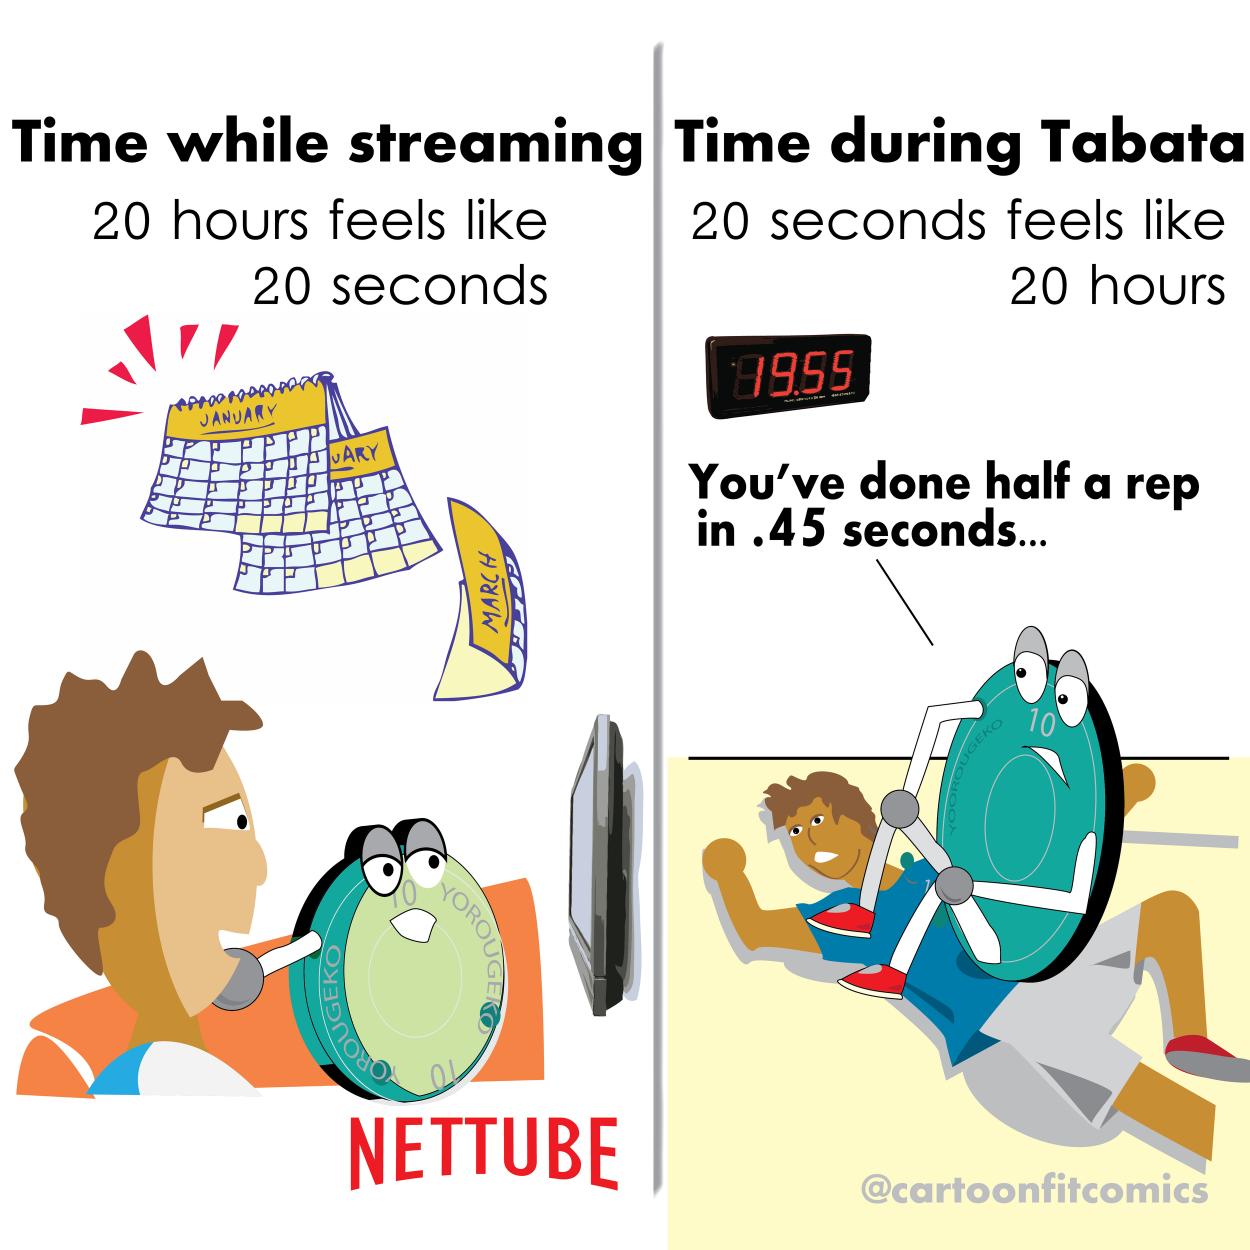 Platey - Cartoon Fit Comics - Streaming - Tabata - Netflix - Youtube